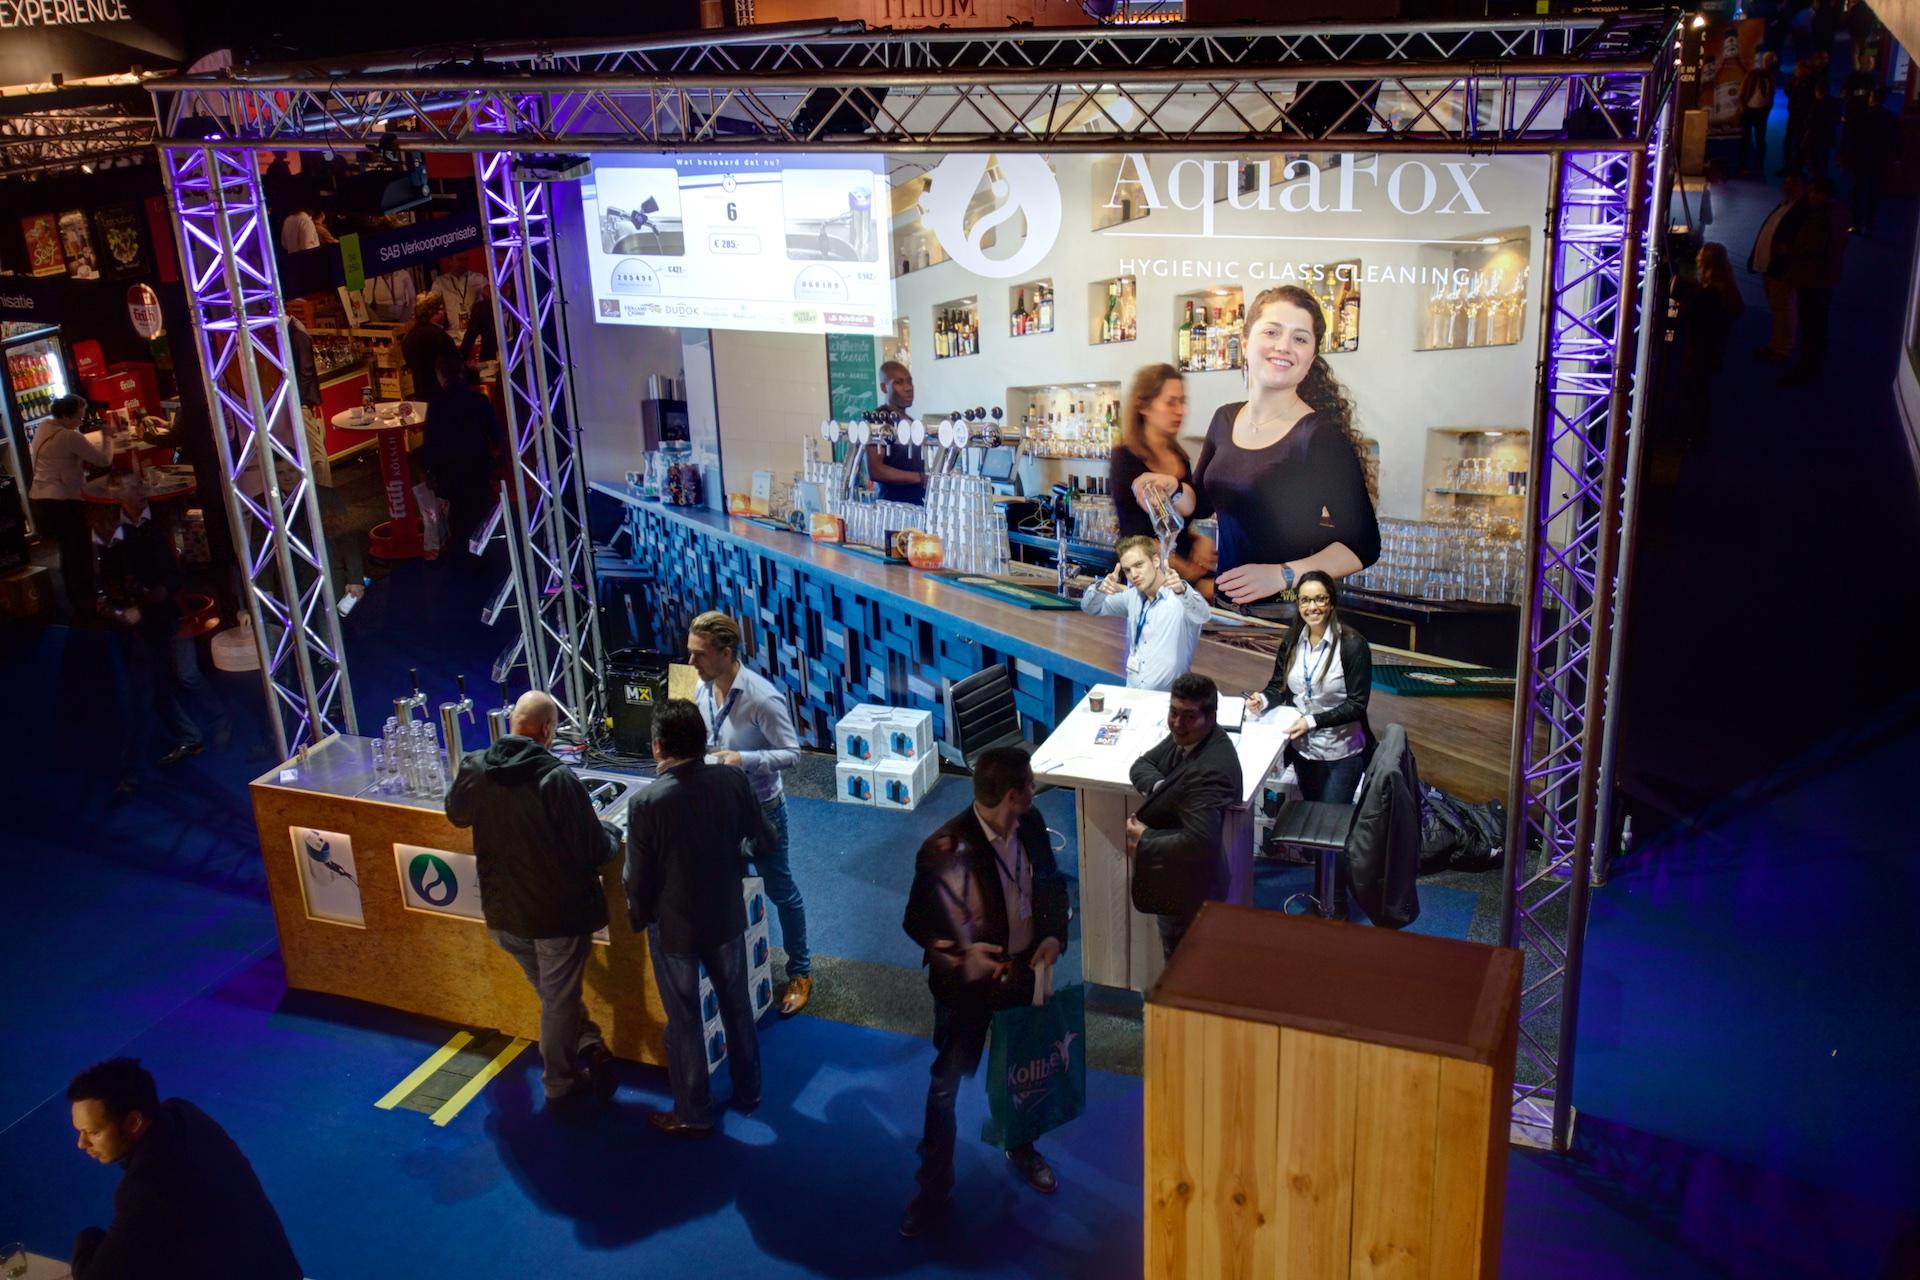 AquaFox Banner at the Horecava Expo